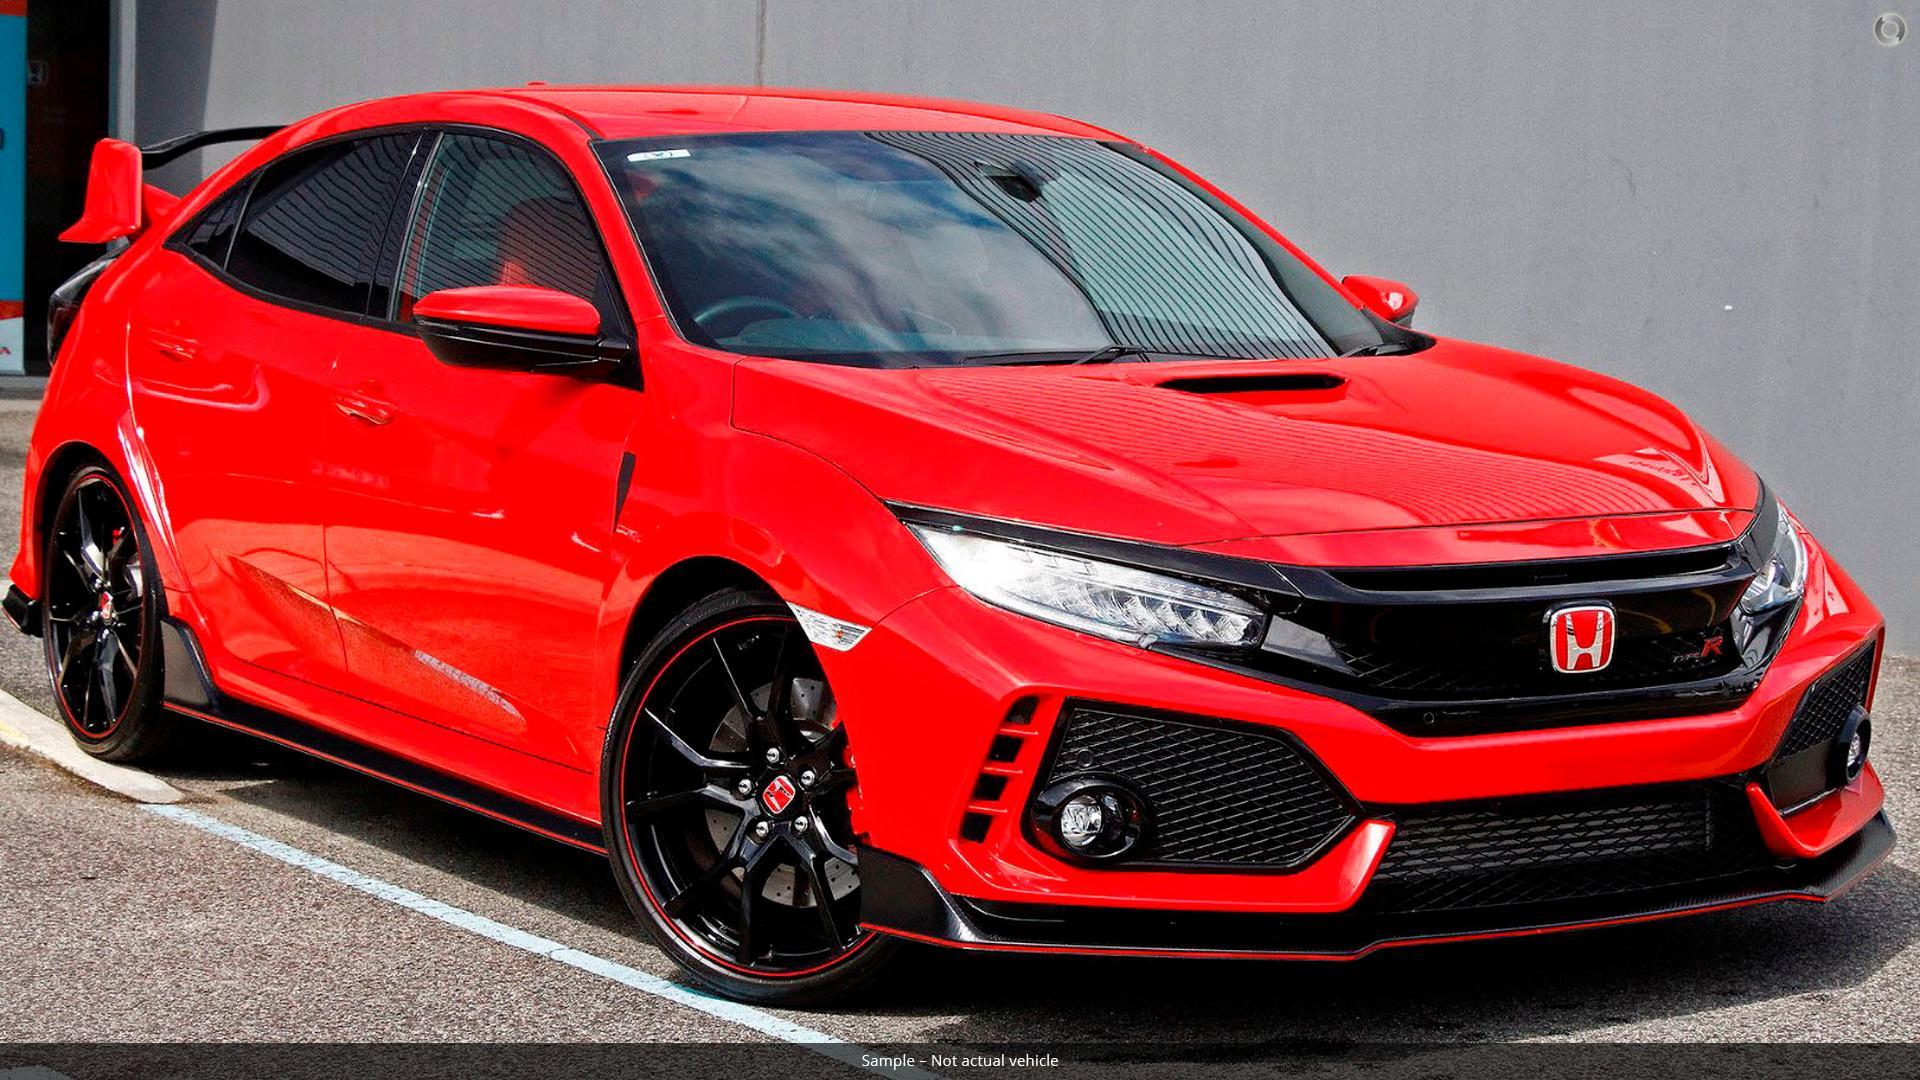 2020 Honda Civic Type R 10th Gen